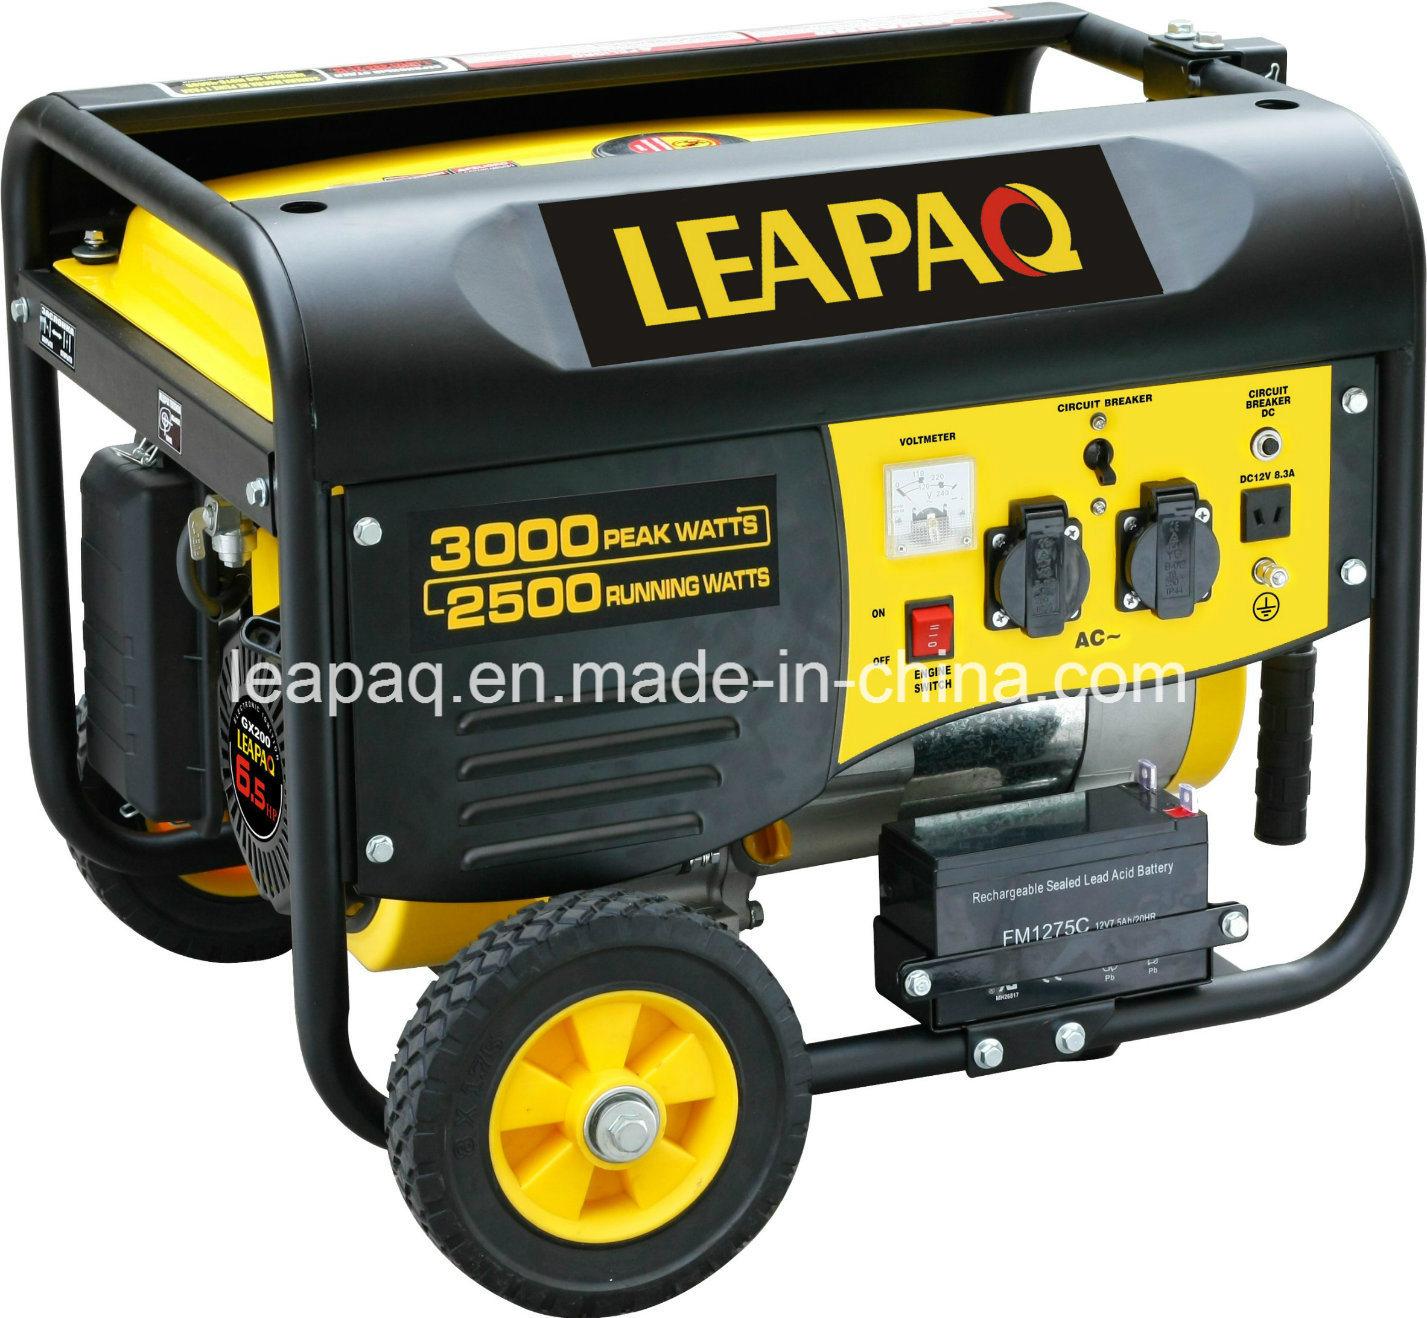 2.5kw Wheels & Handle P-Type Portable Gasoline Generator